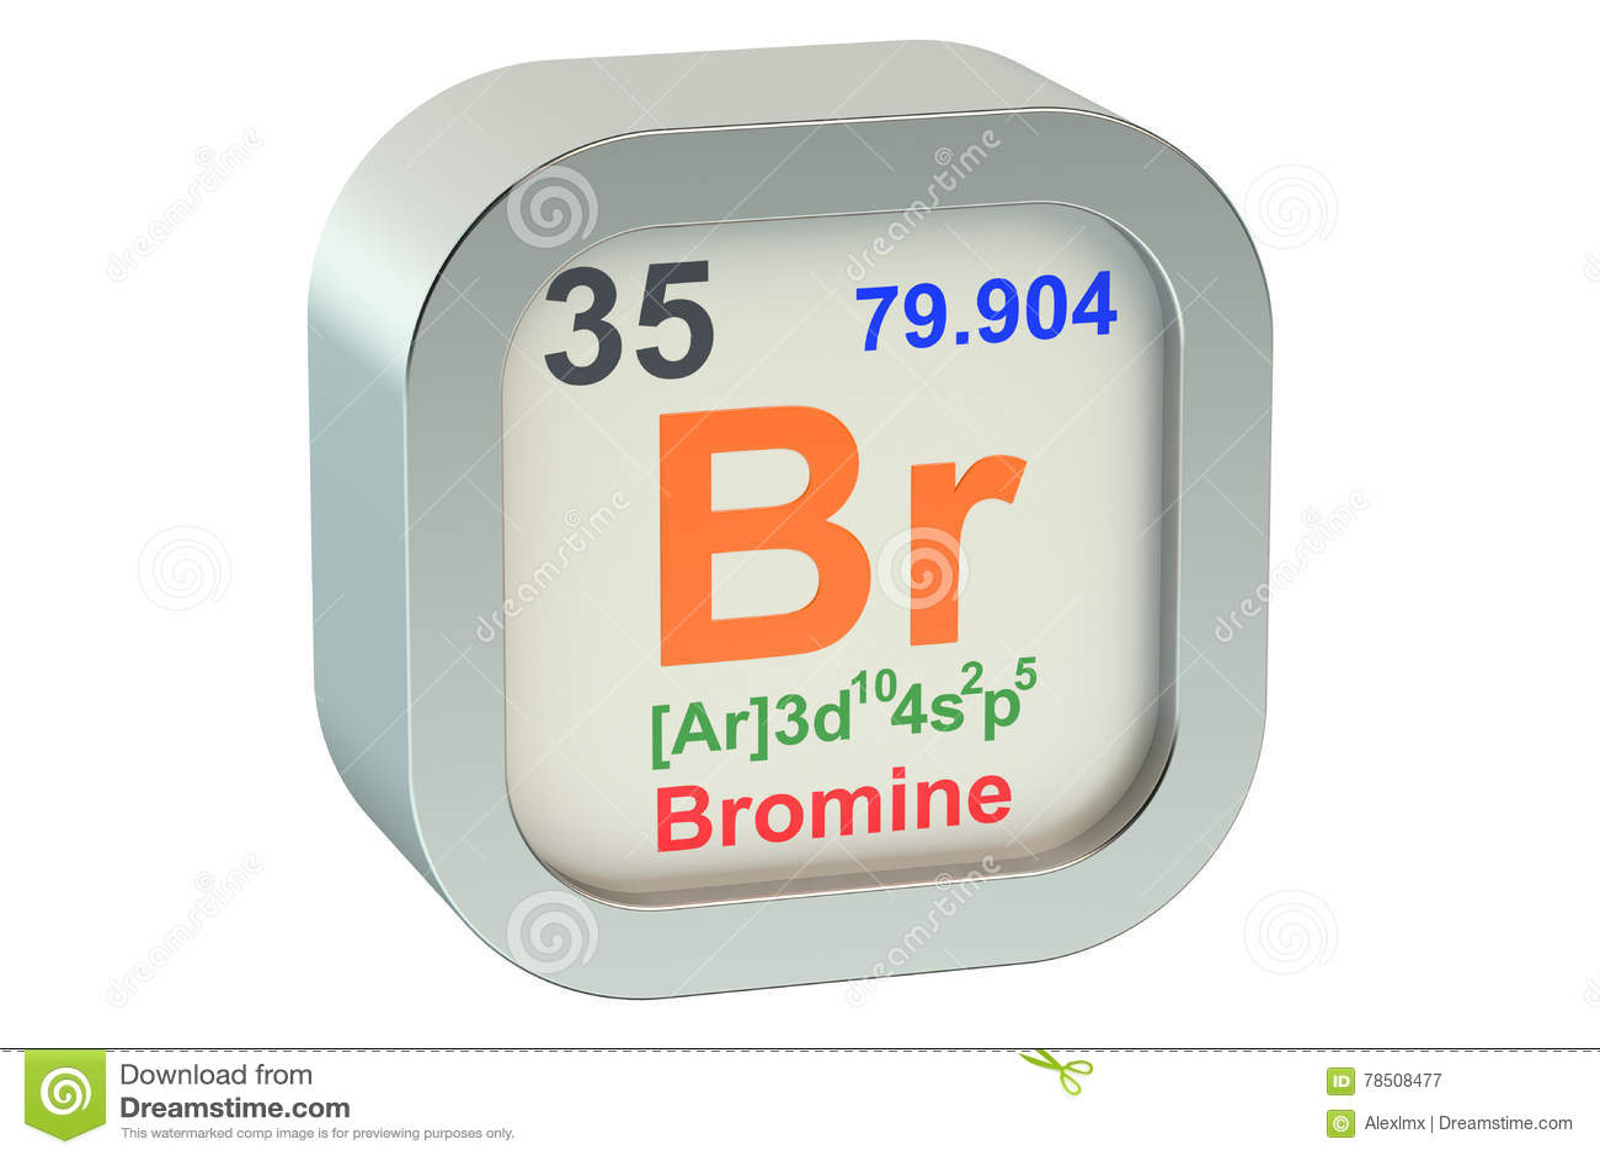 Bromine 3d stock illustration illustration of number 78508477 bromine 3d biocorpaavc